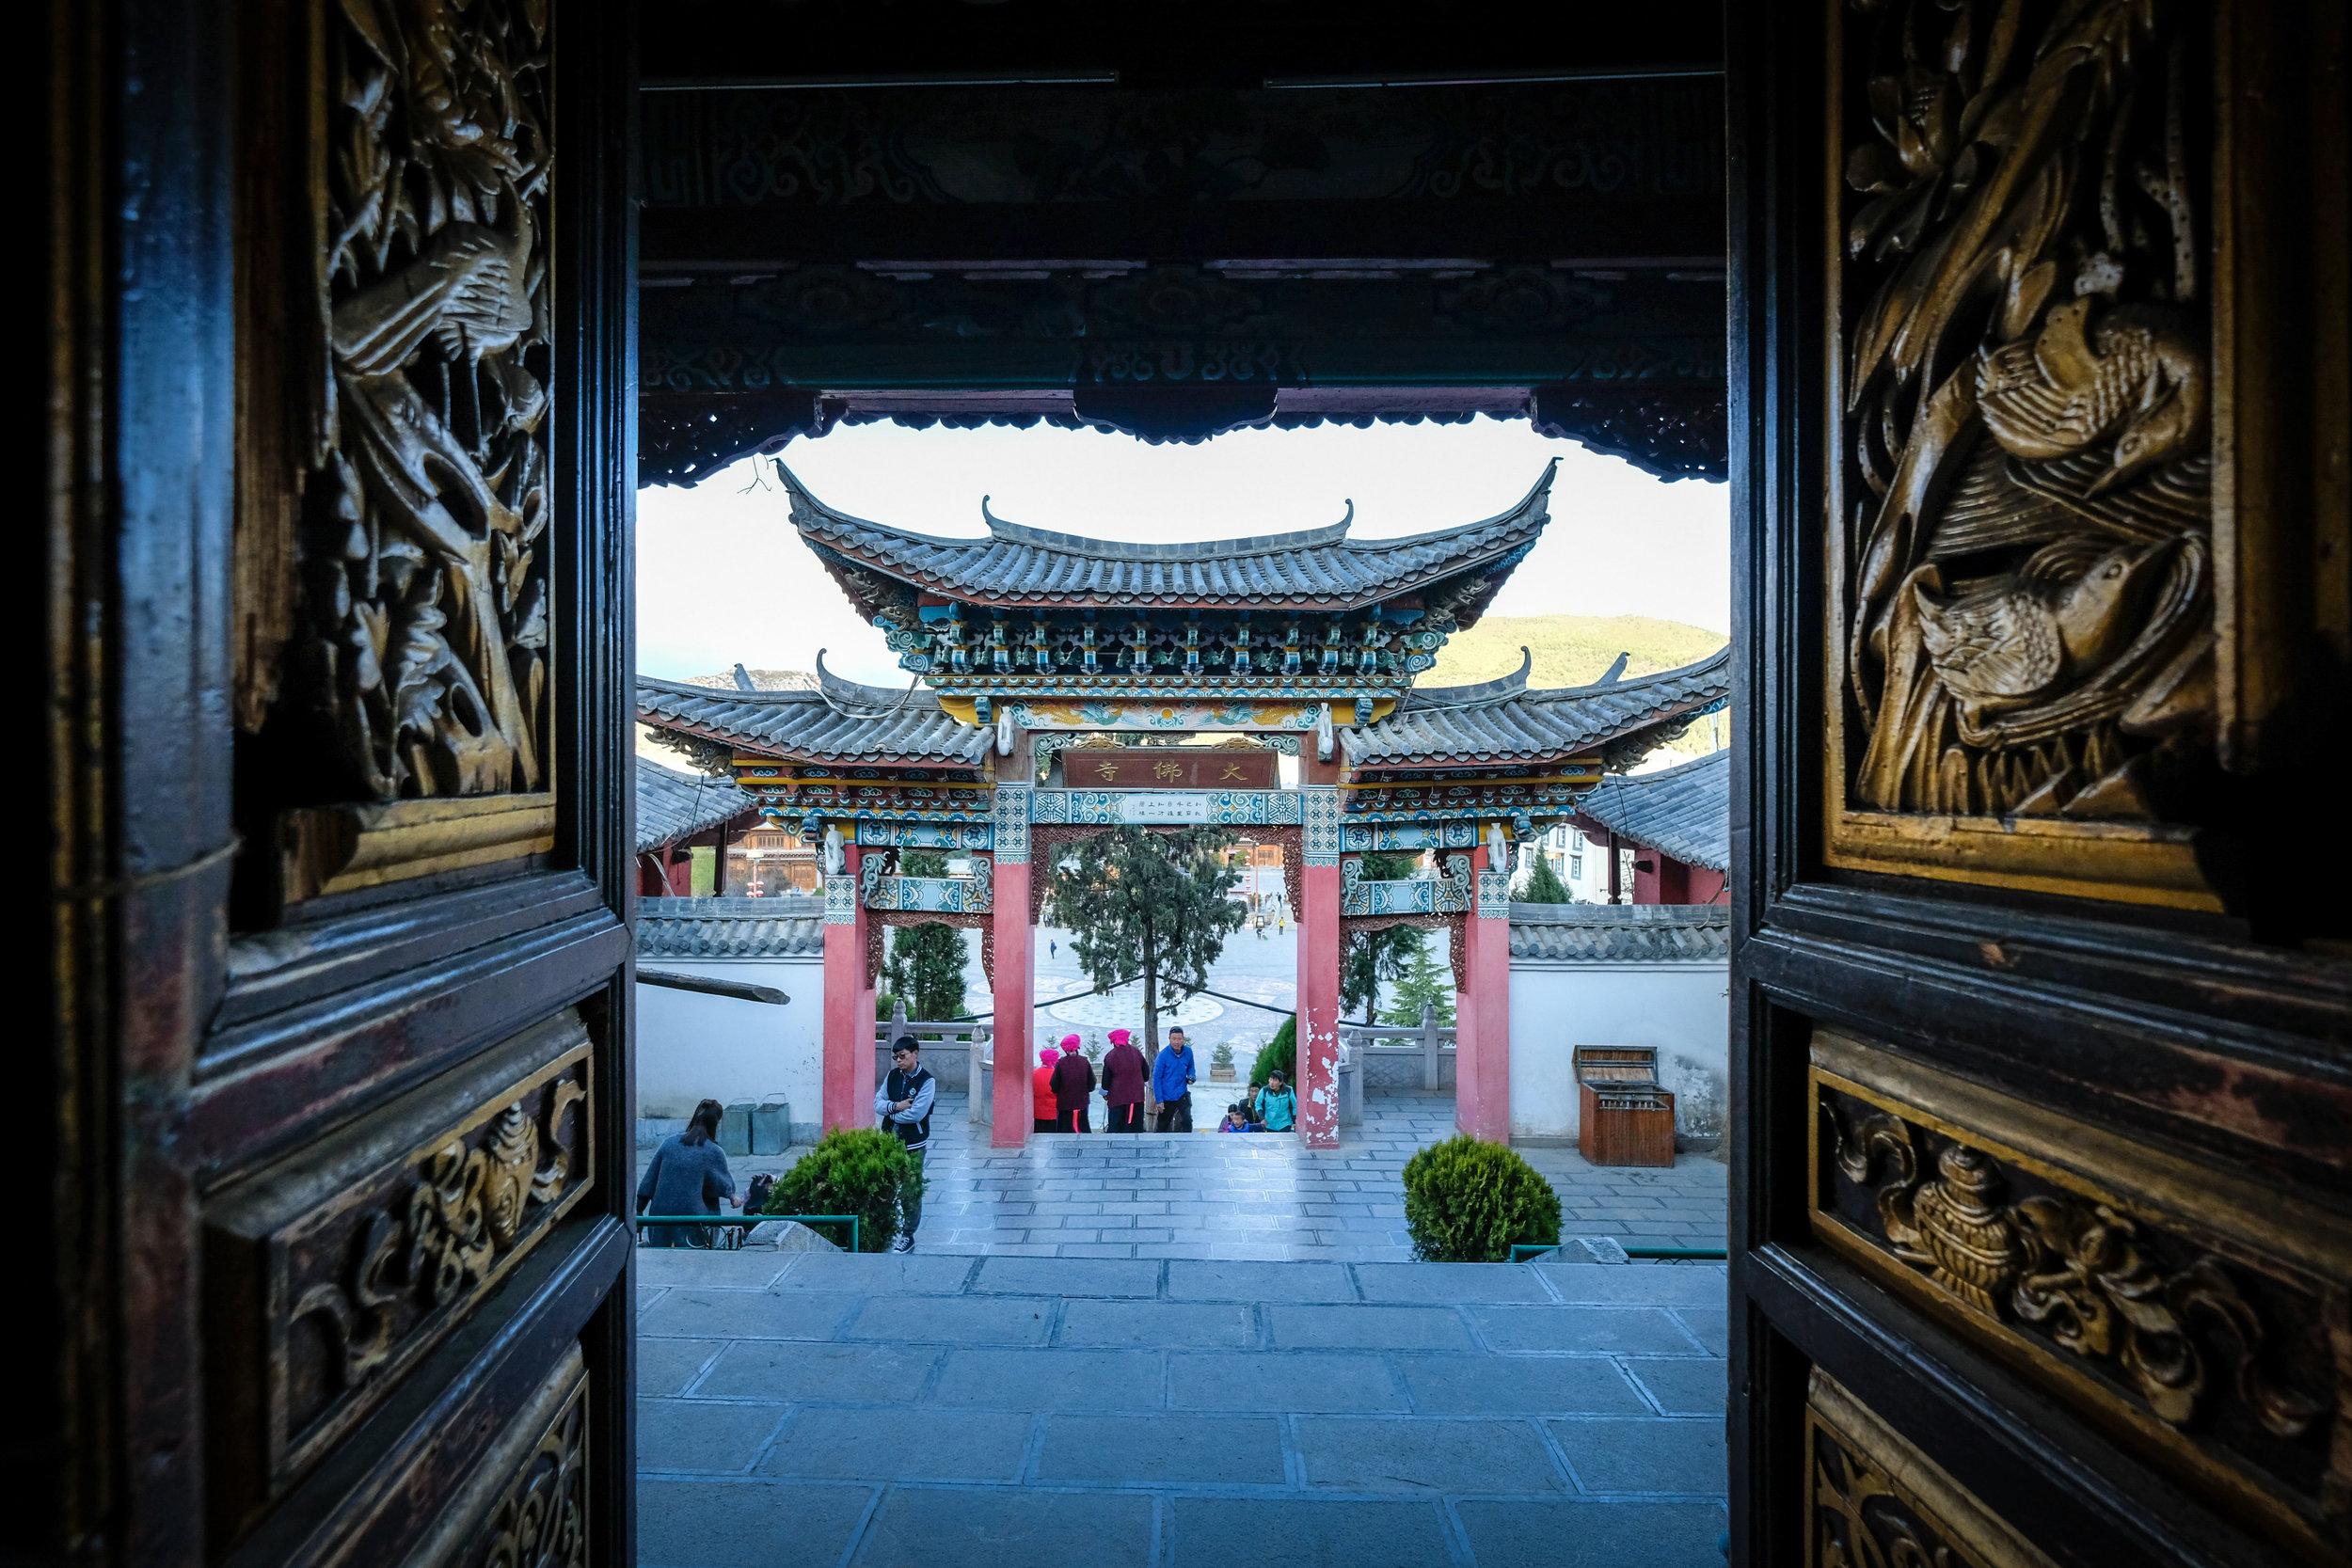 Zhongdian_lo-res-2517.jpg